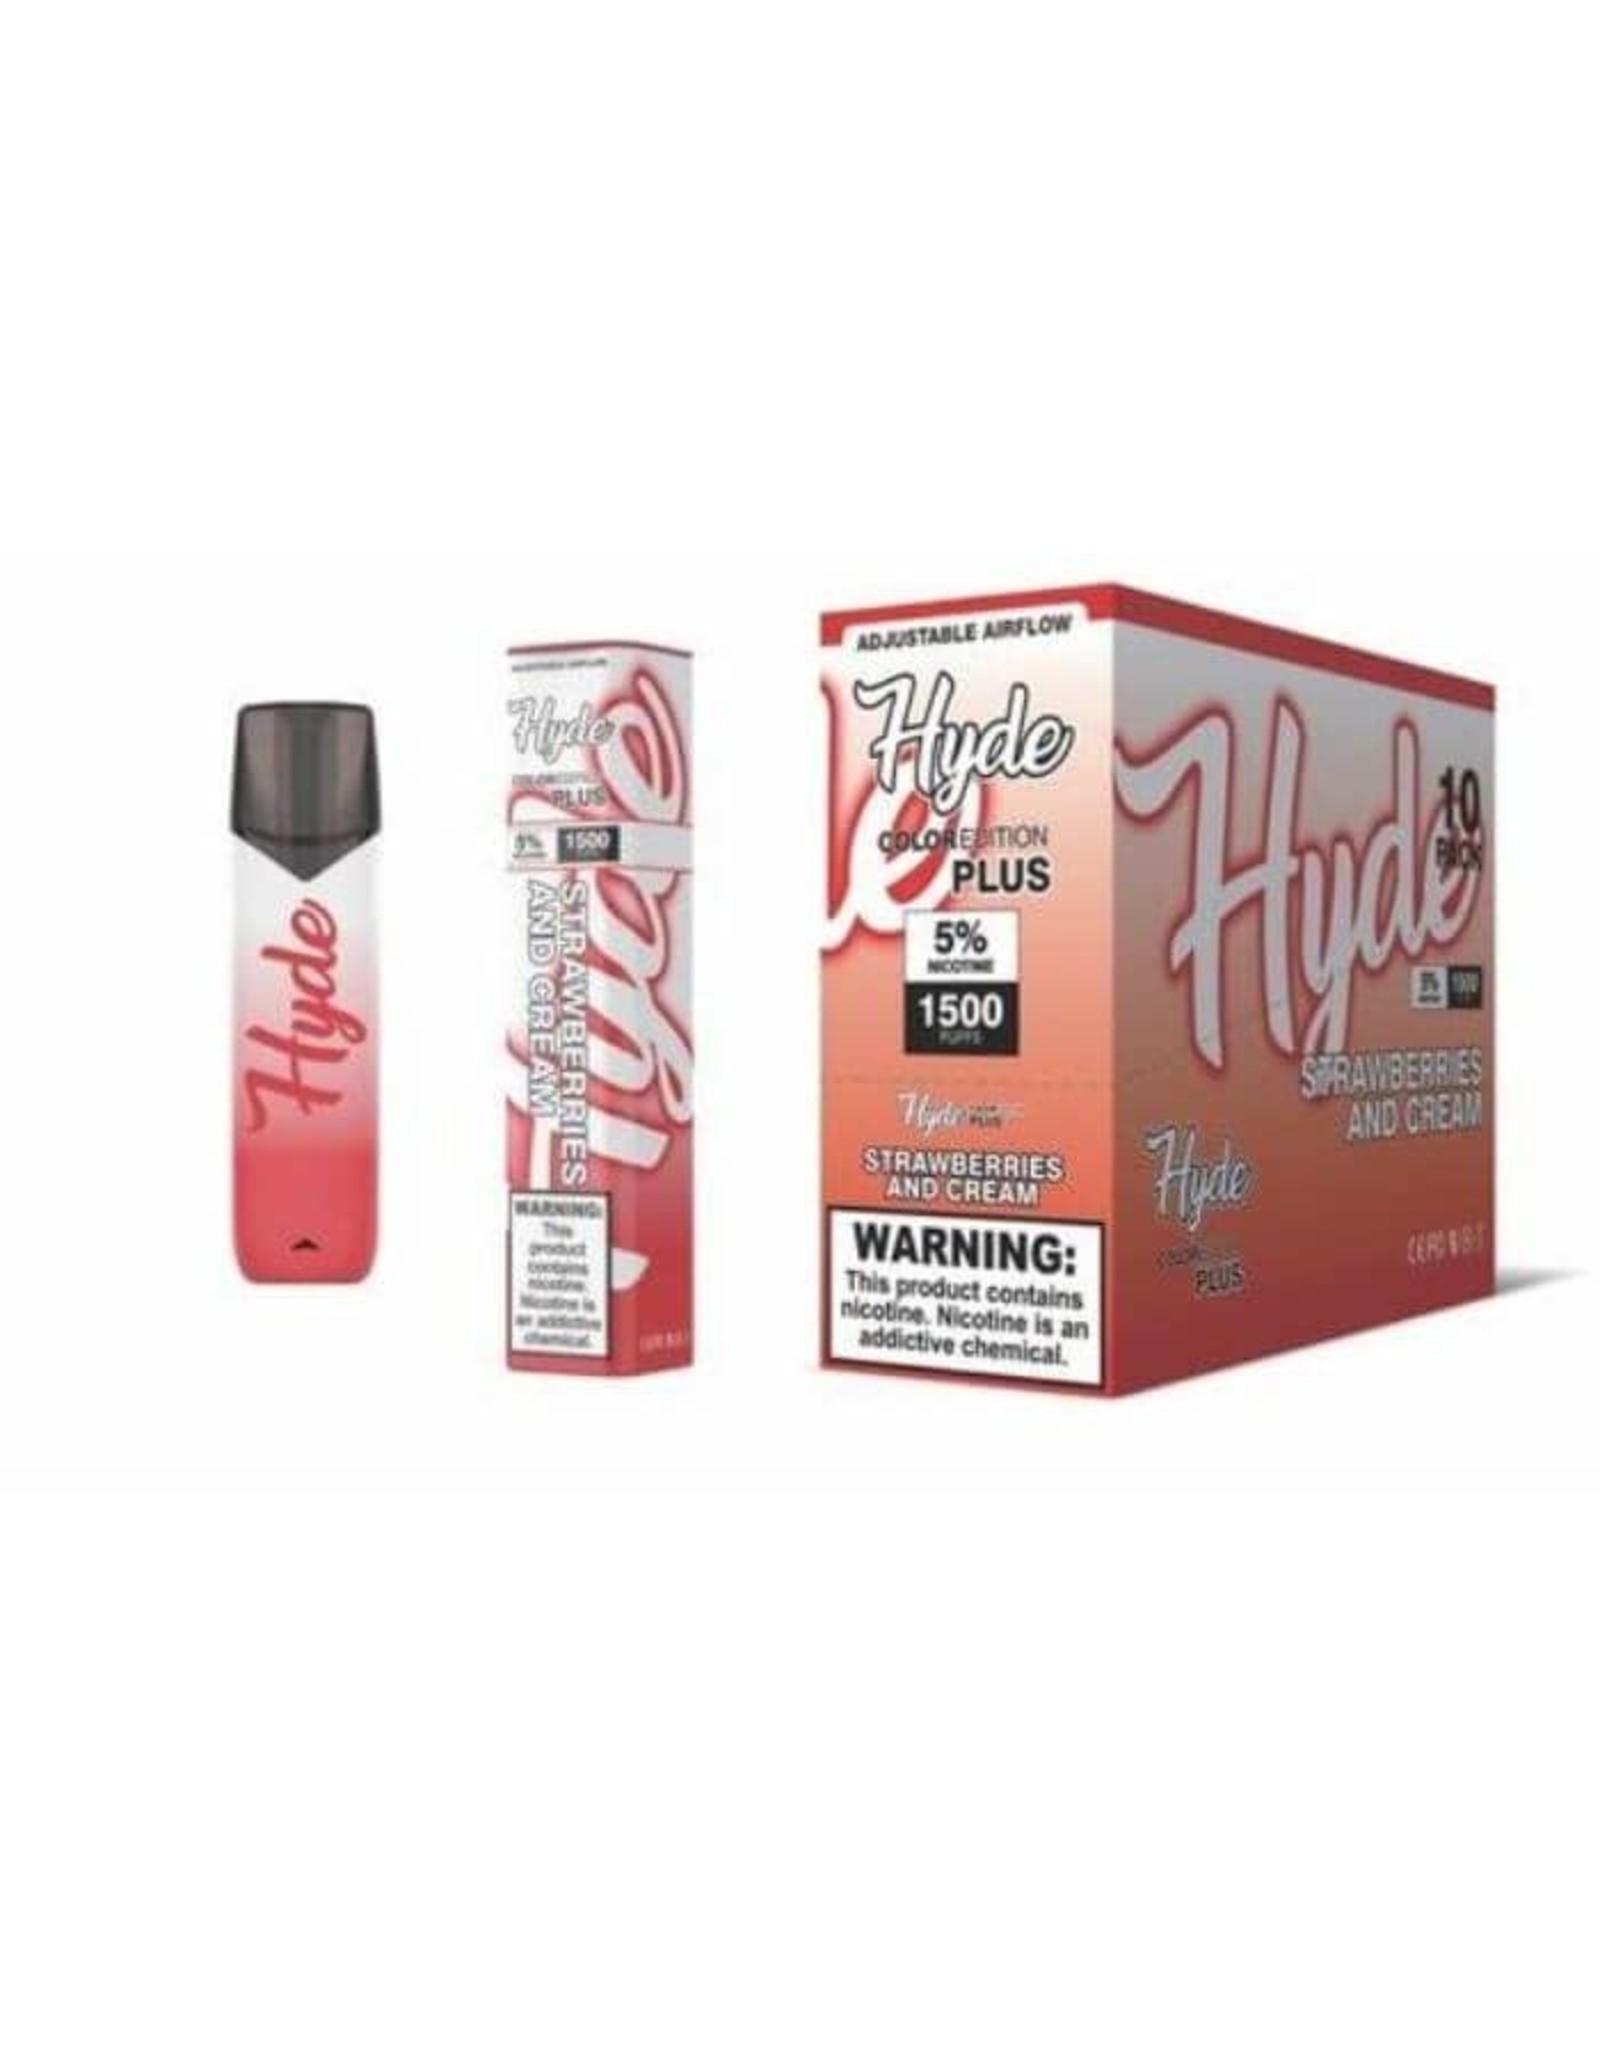 Hyde Hyde Color Plus Strawberries & Cream 1500puff